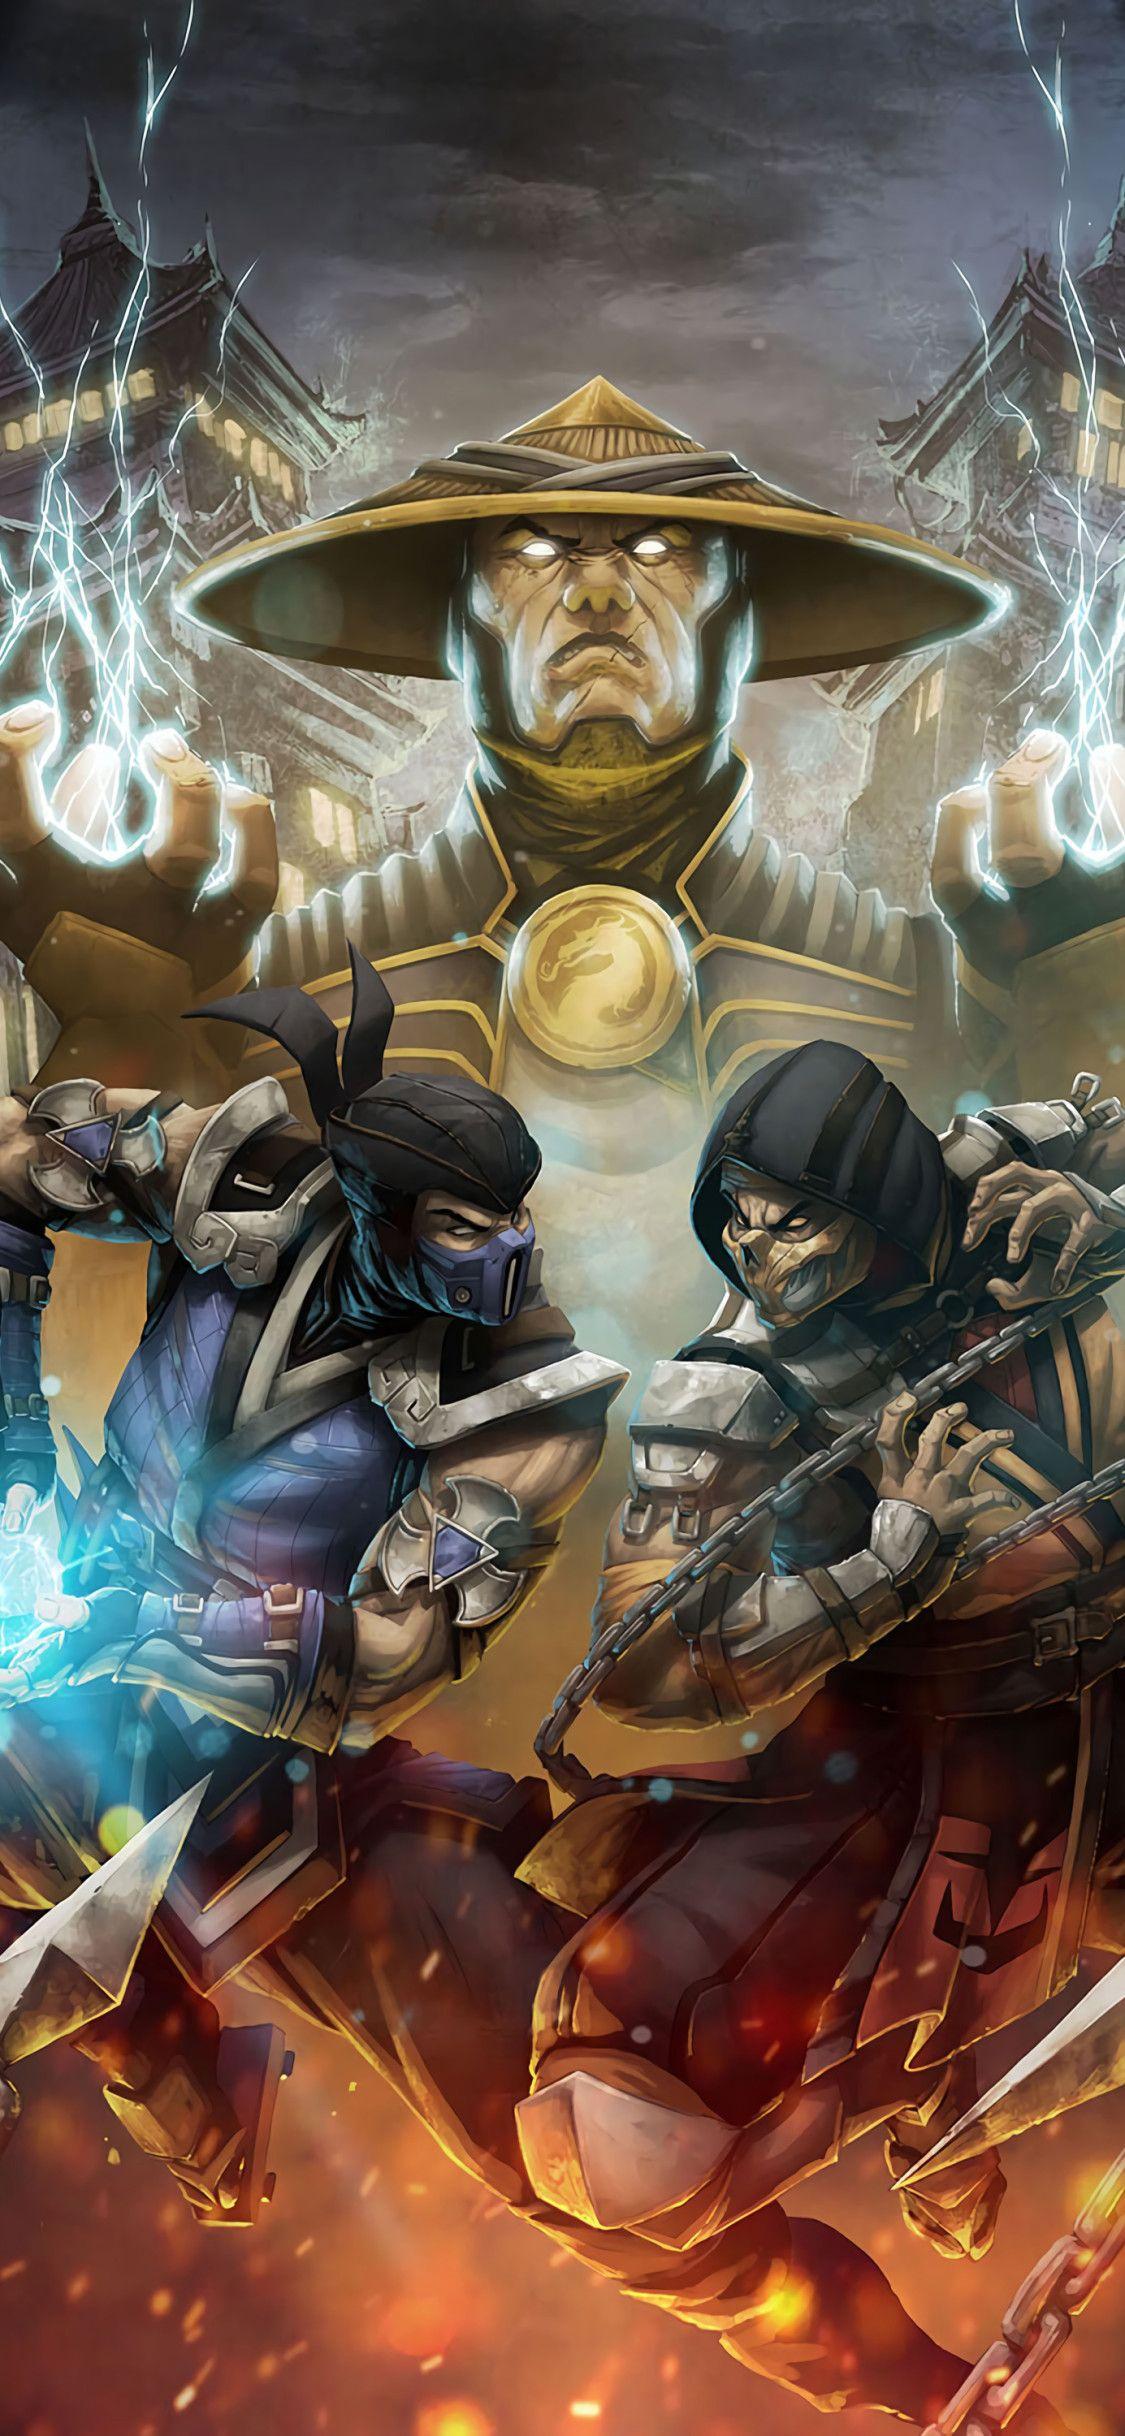 Mortal Kombat HD iPhone Wallpapers - Wallpaper Cave